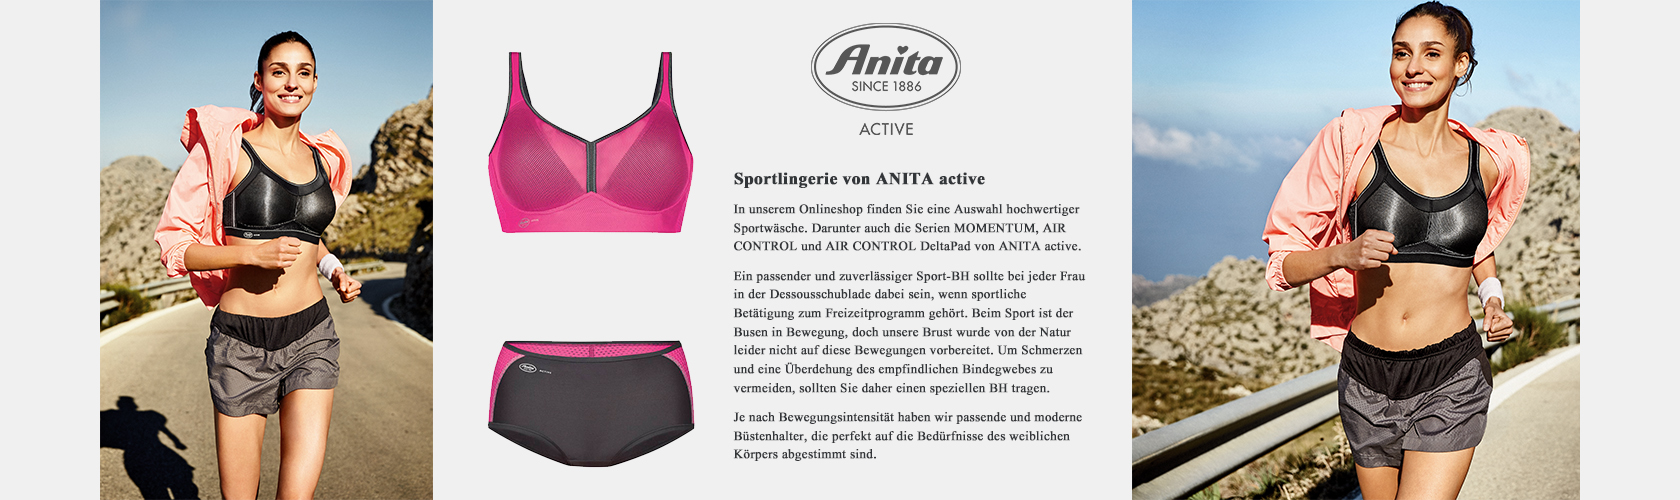 Slideshow ANITA Sport 10.07.